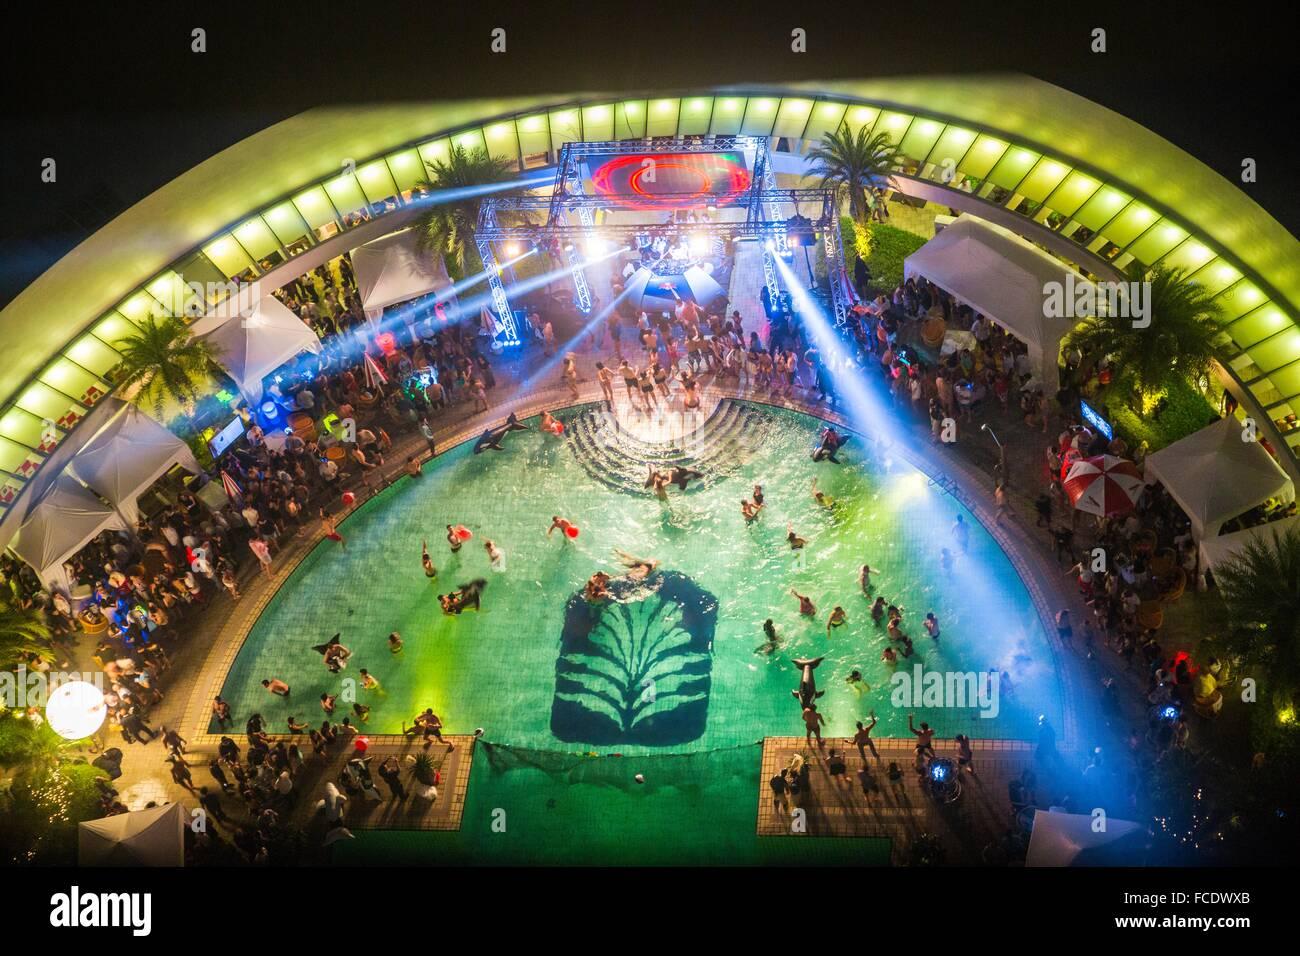 Singapore Asia Pan Pacific Hotel Stockfotos Und Bilder Kaufen Alamy